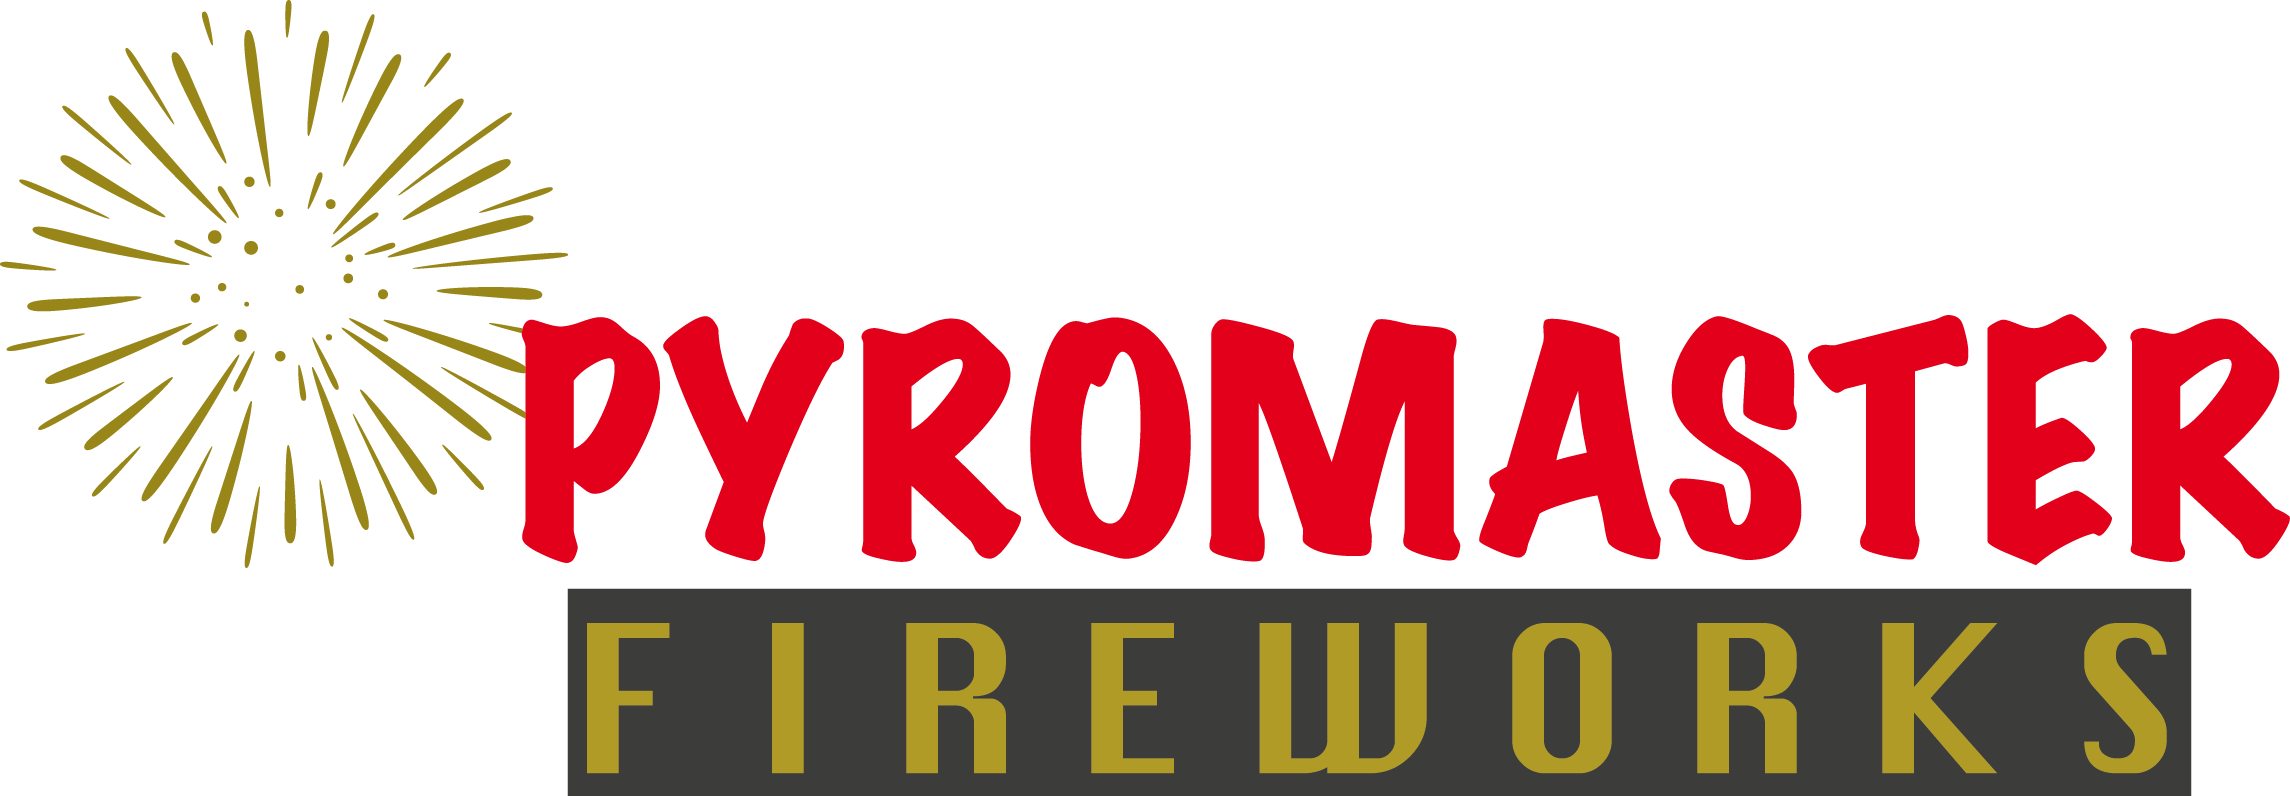 Pyromaster-fireworks